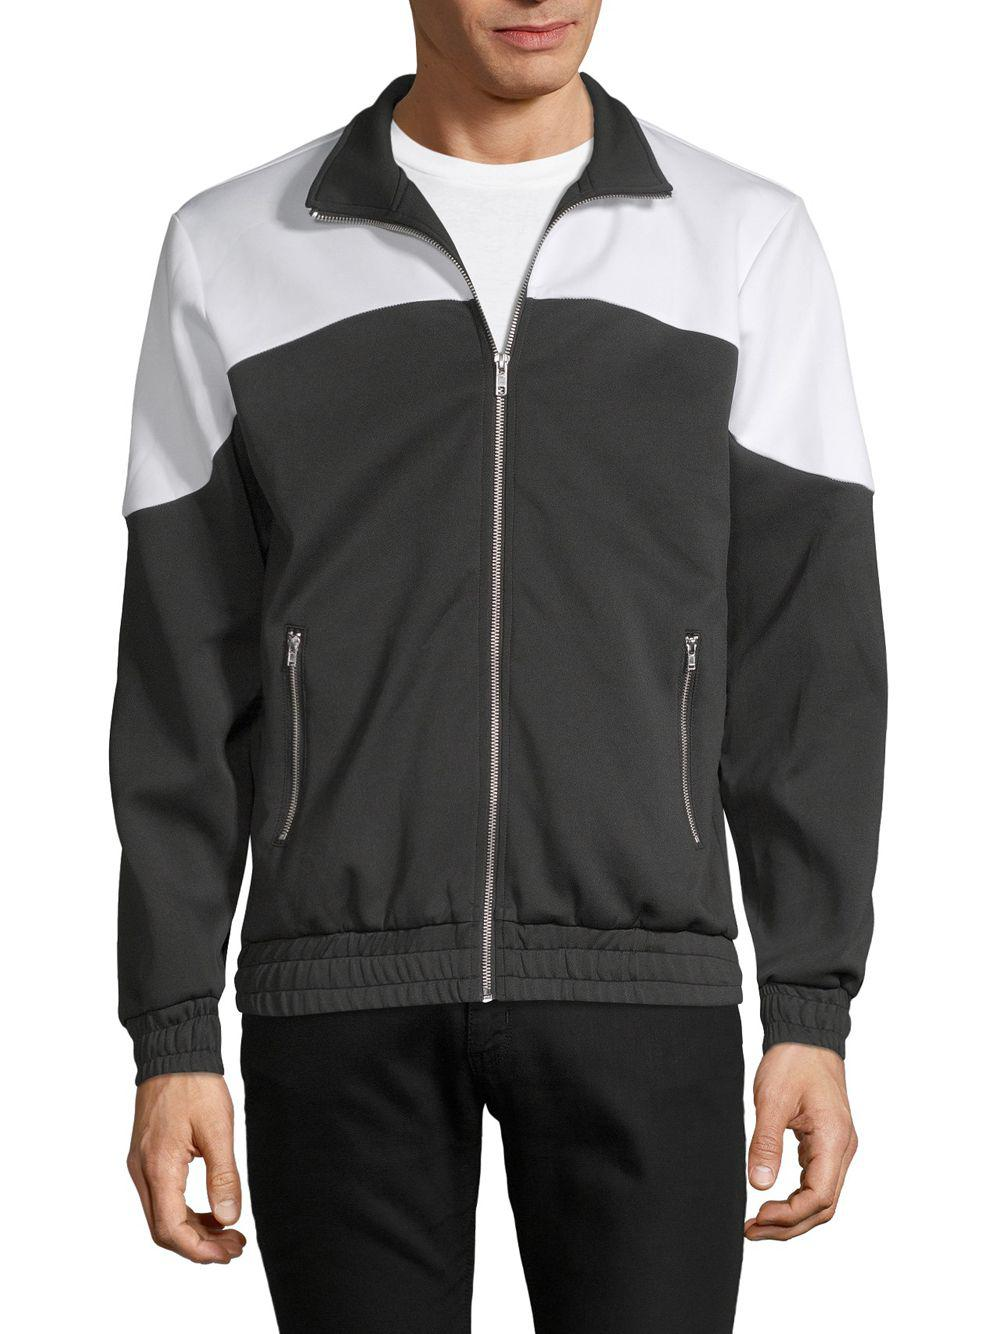 0c385efb0c9 Russell Park Colorblock Zip Track Jacket in Black for Men - Lyst